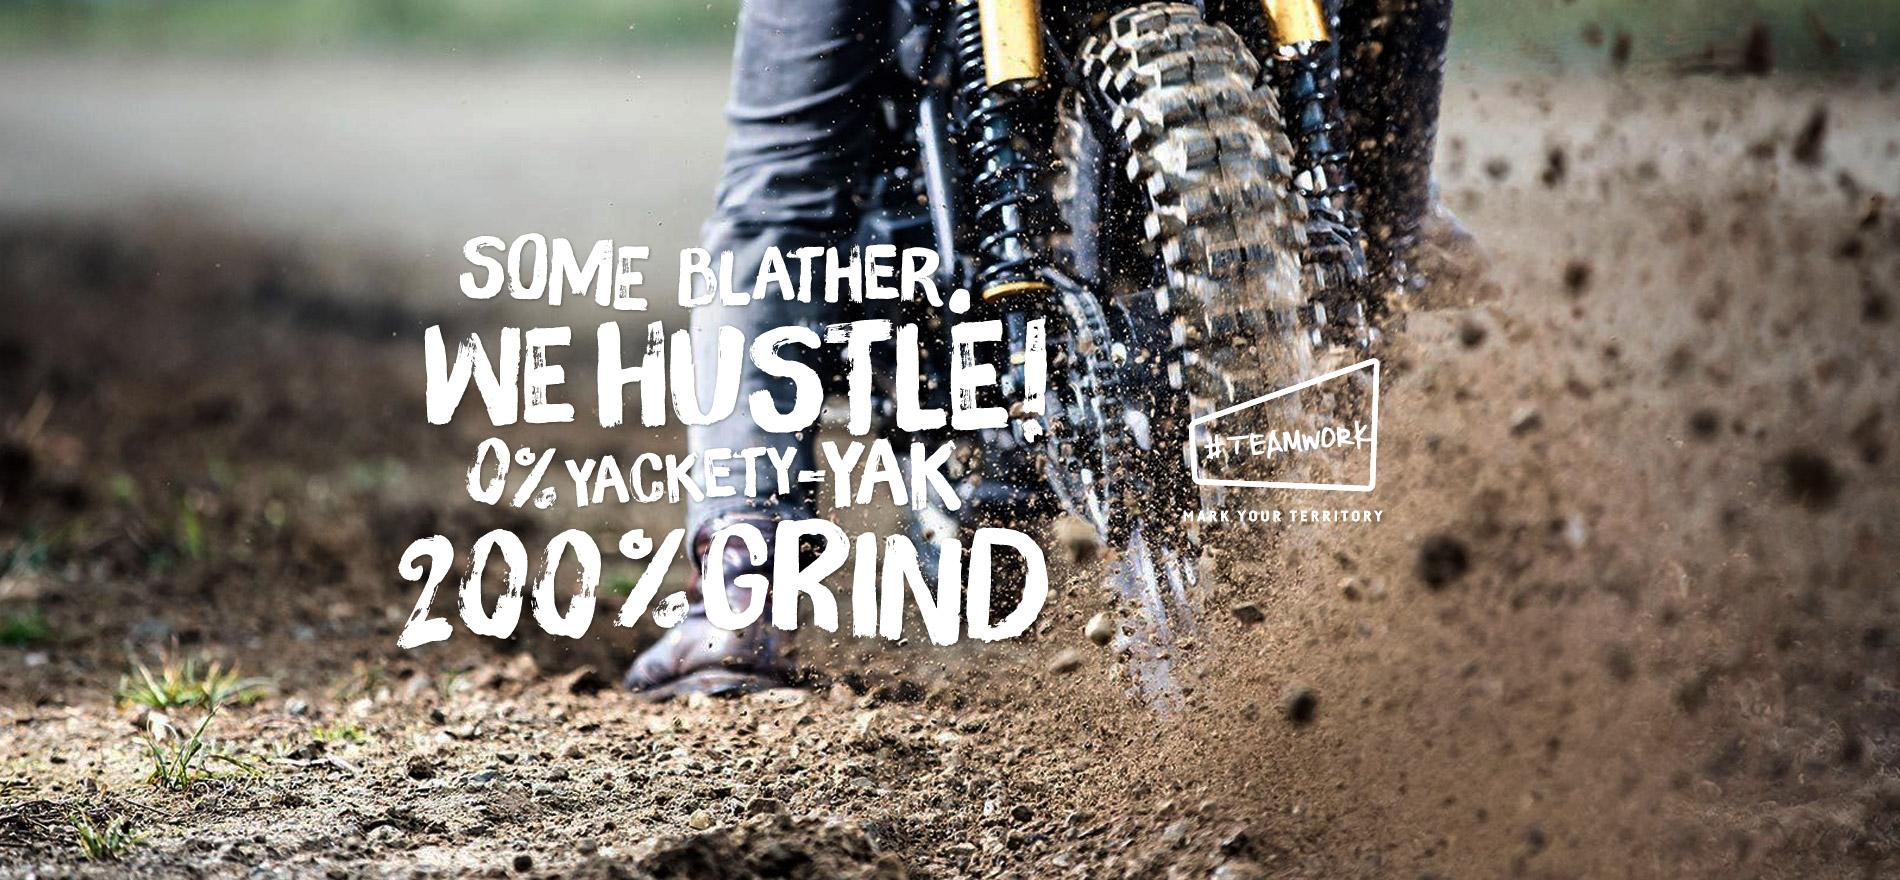 TITAN-Motorcycle-Co-Graz-Austria-TeamWork-No-BlahBlah-We-Hustle-Just-Do_WorkHard-PlayHard